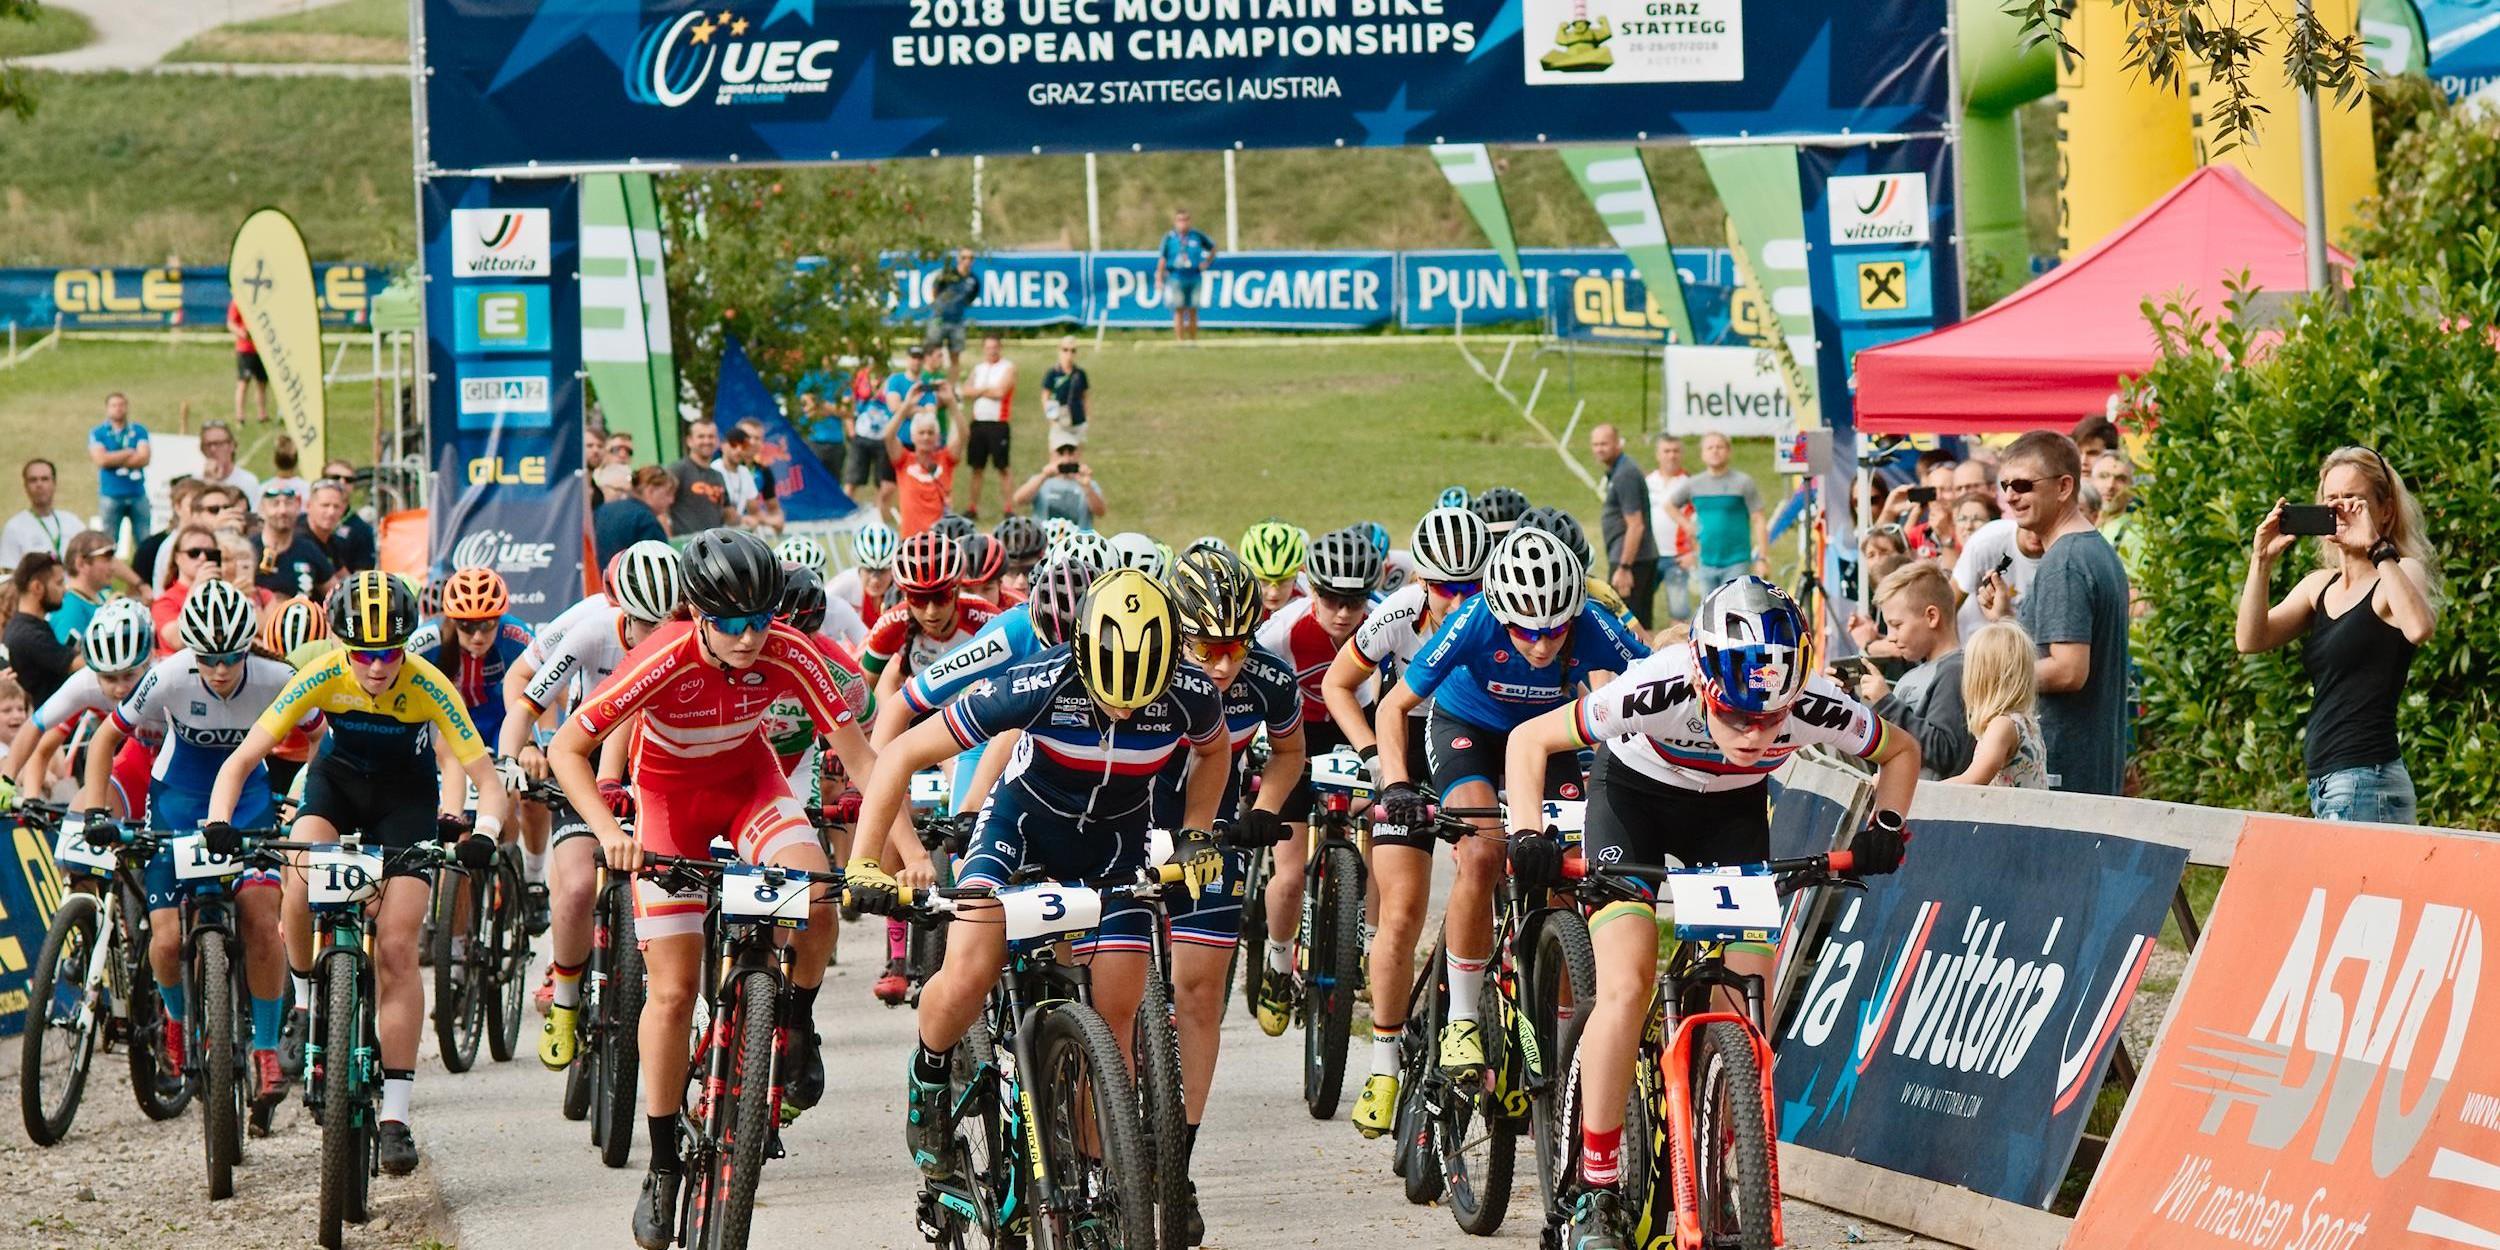 Bildbericht Europameisterschaften Graz/Stattegg